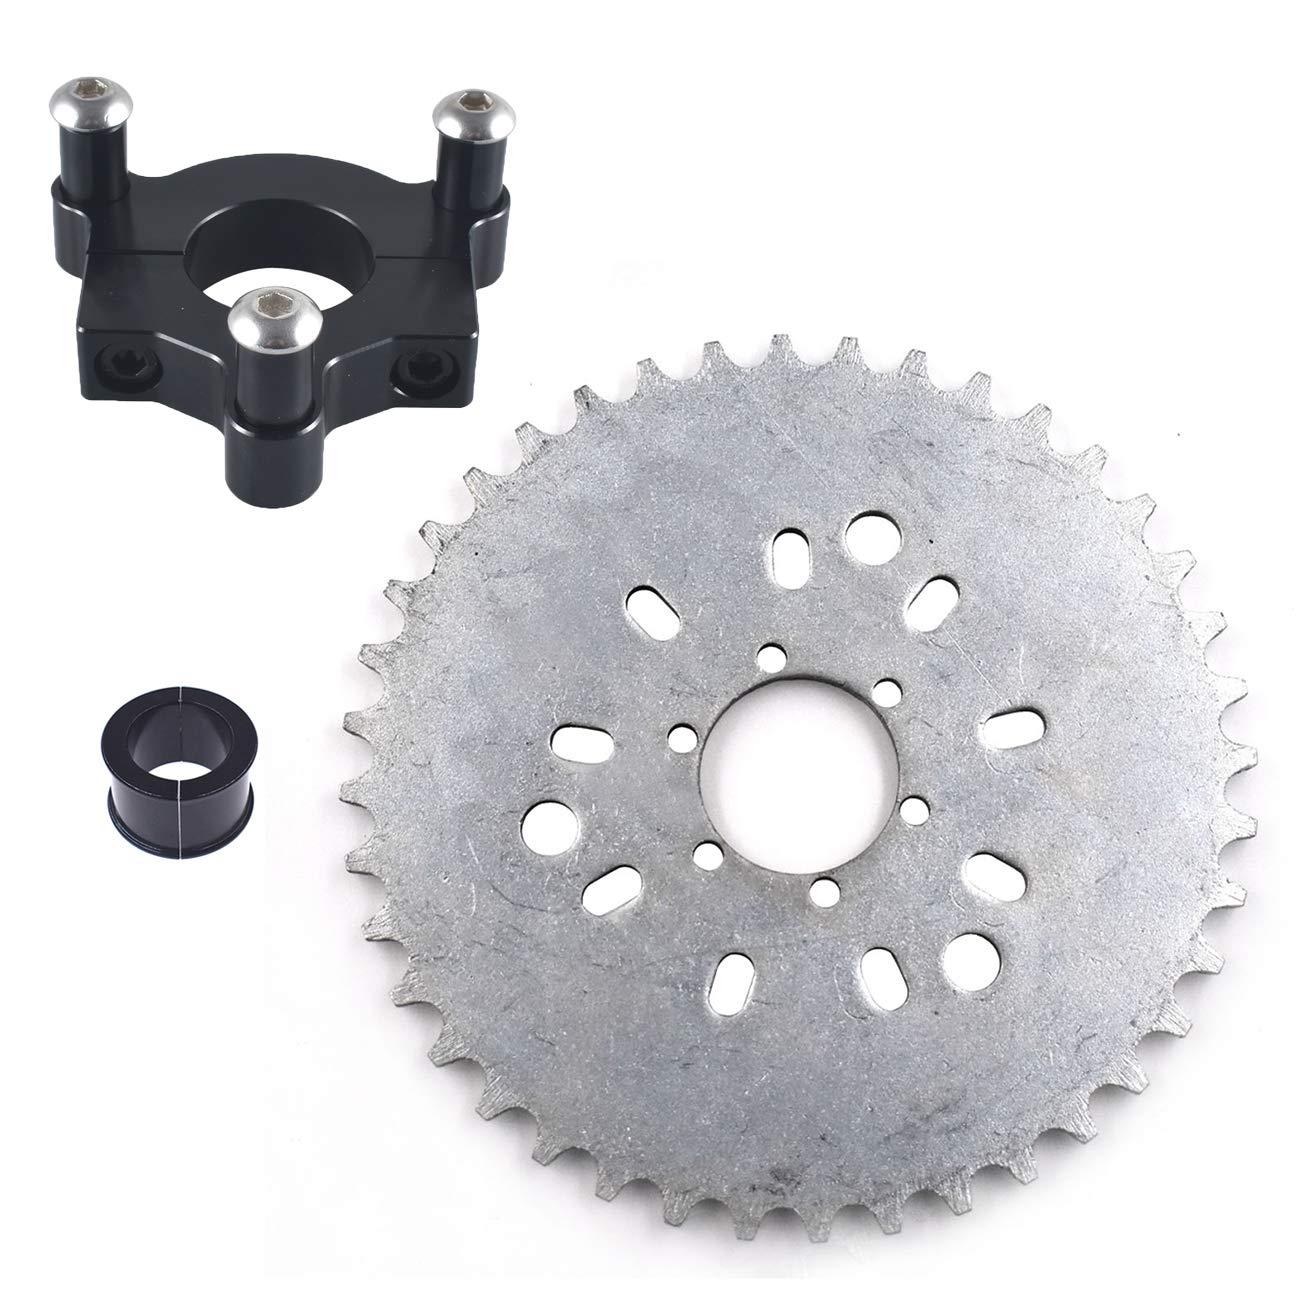 1.5 38mm CNC Adapter 40T Sprocket Fits 49cc 50cc 60cc 66cc 80cc Motorized Bicycle UAUS 1 25mm